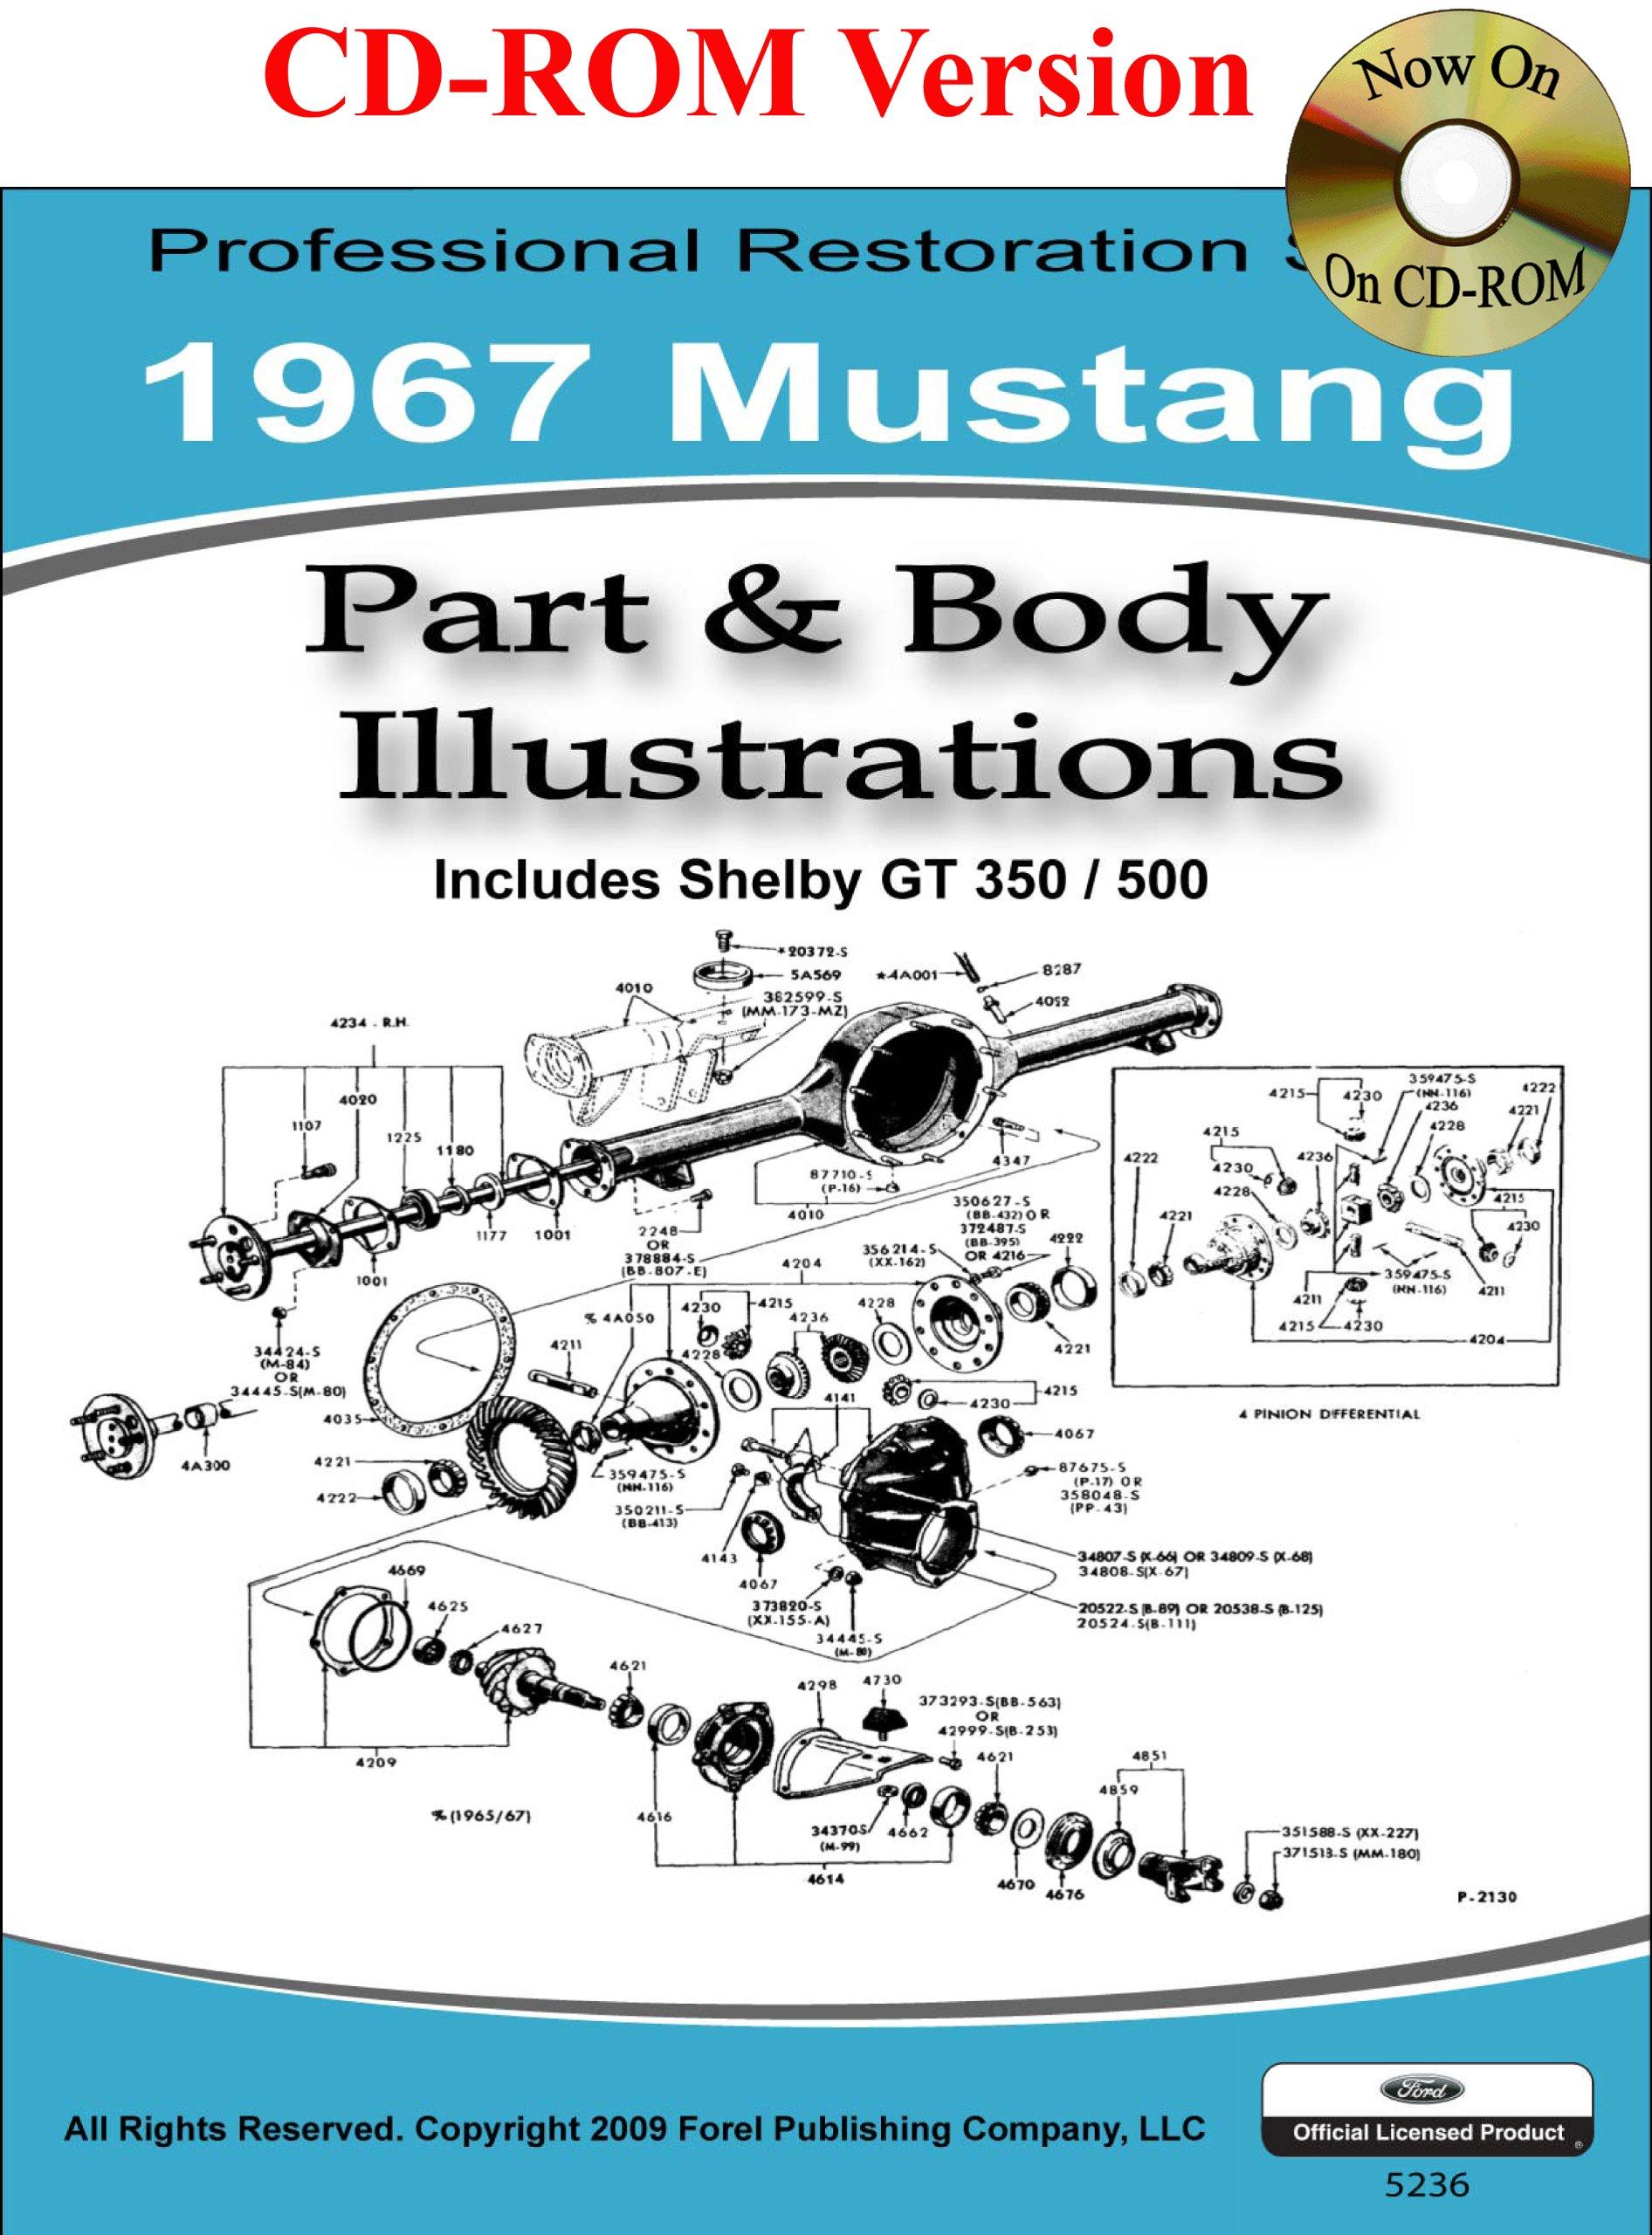 1967 Mustang Part And Body Illustrations Ford Motor Company David Xh Wiring Diagram E Leblanc 9781603710350 Books